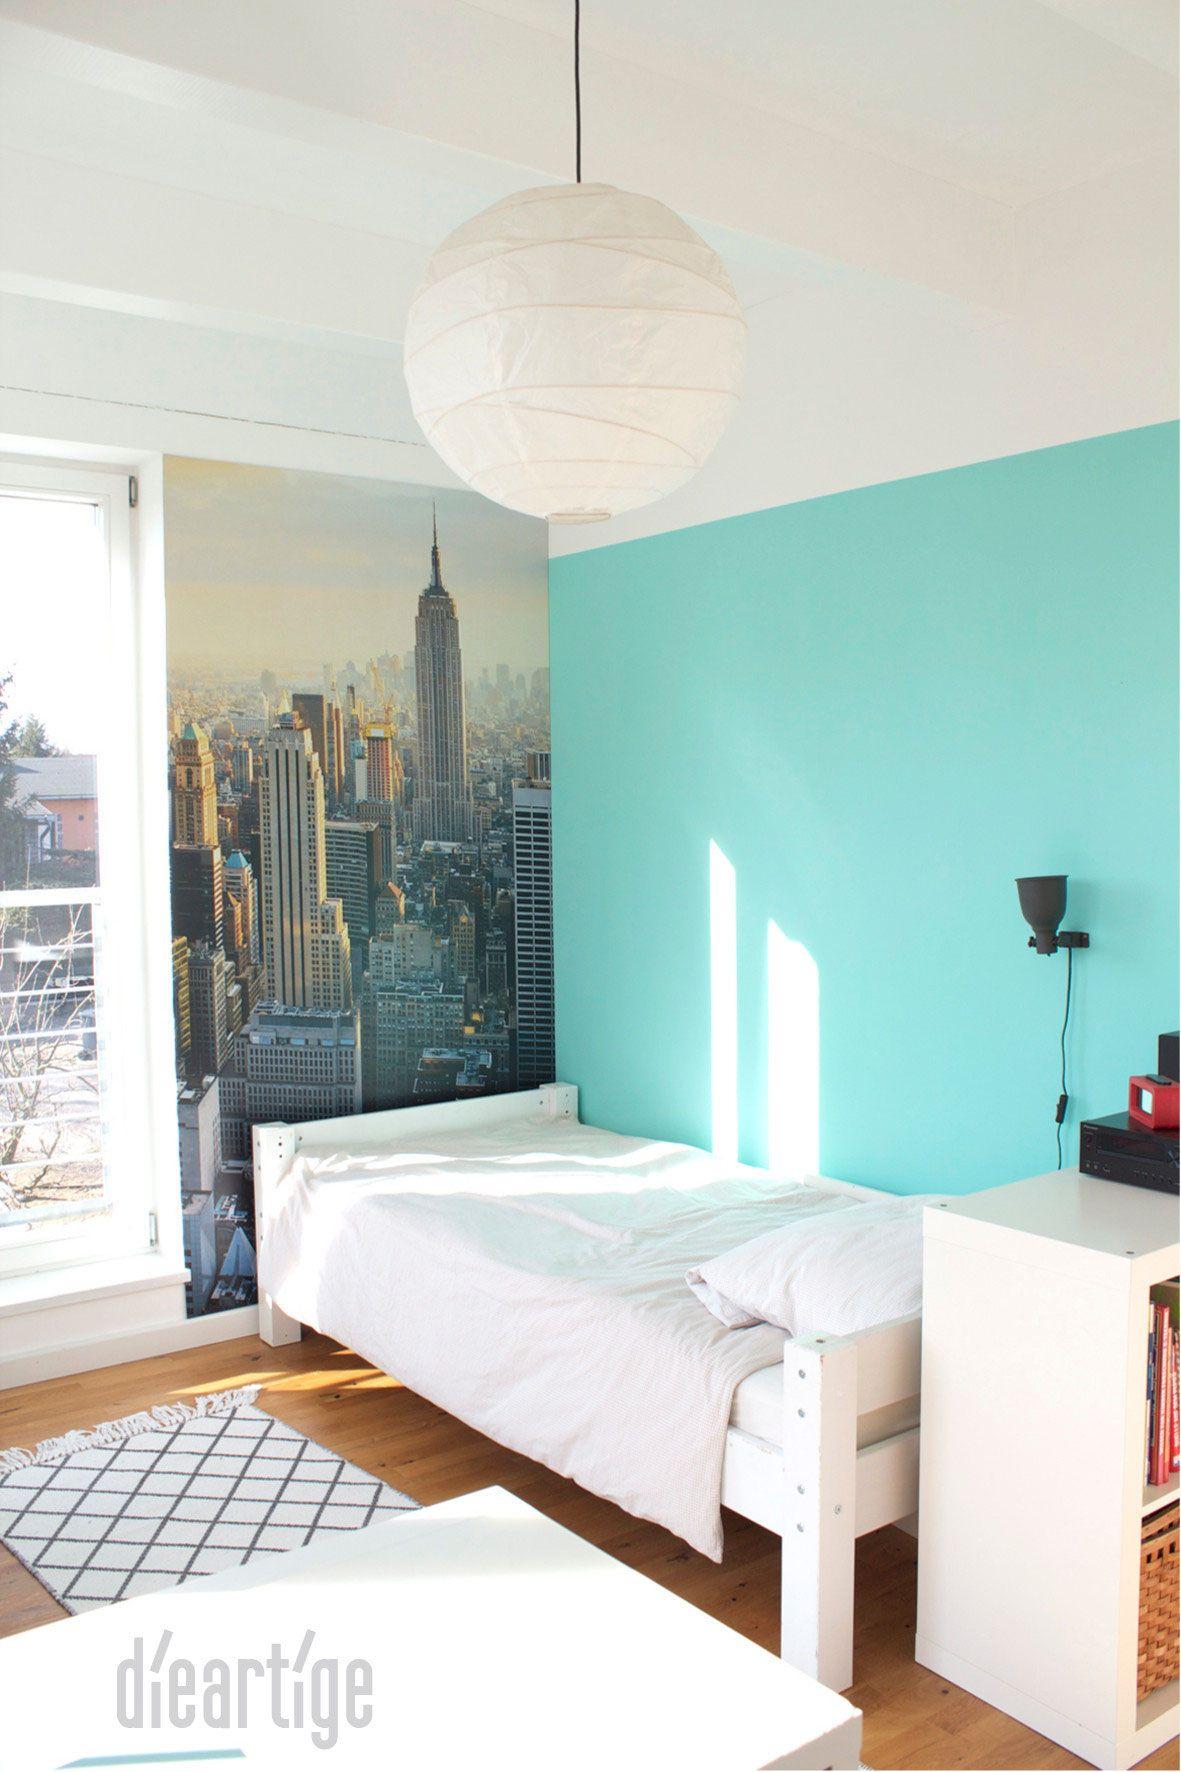 Schlafzimmer Len Design dieartigeblog kinderzimmer upgrade jugend jungen zimmer in mint